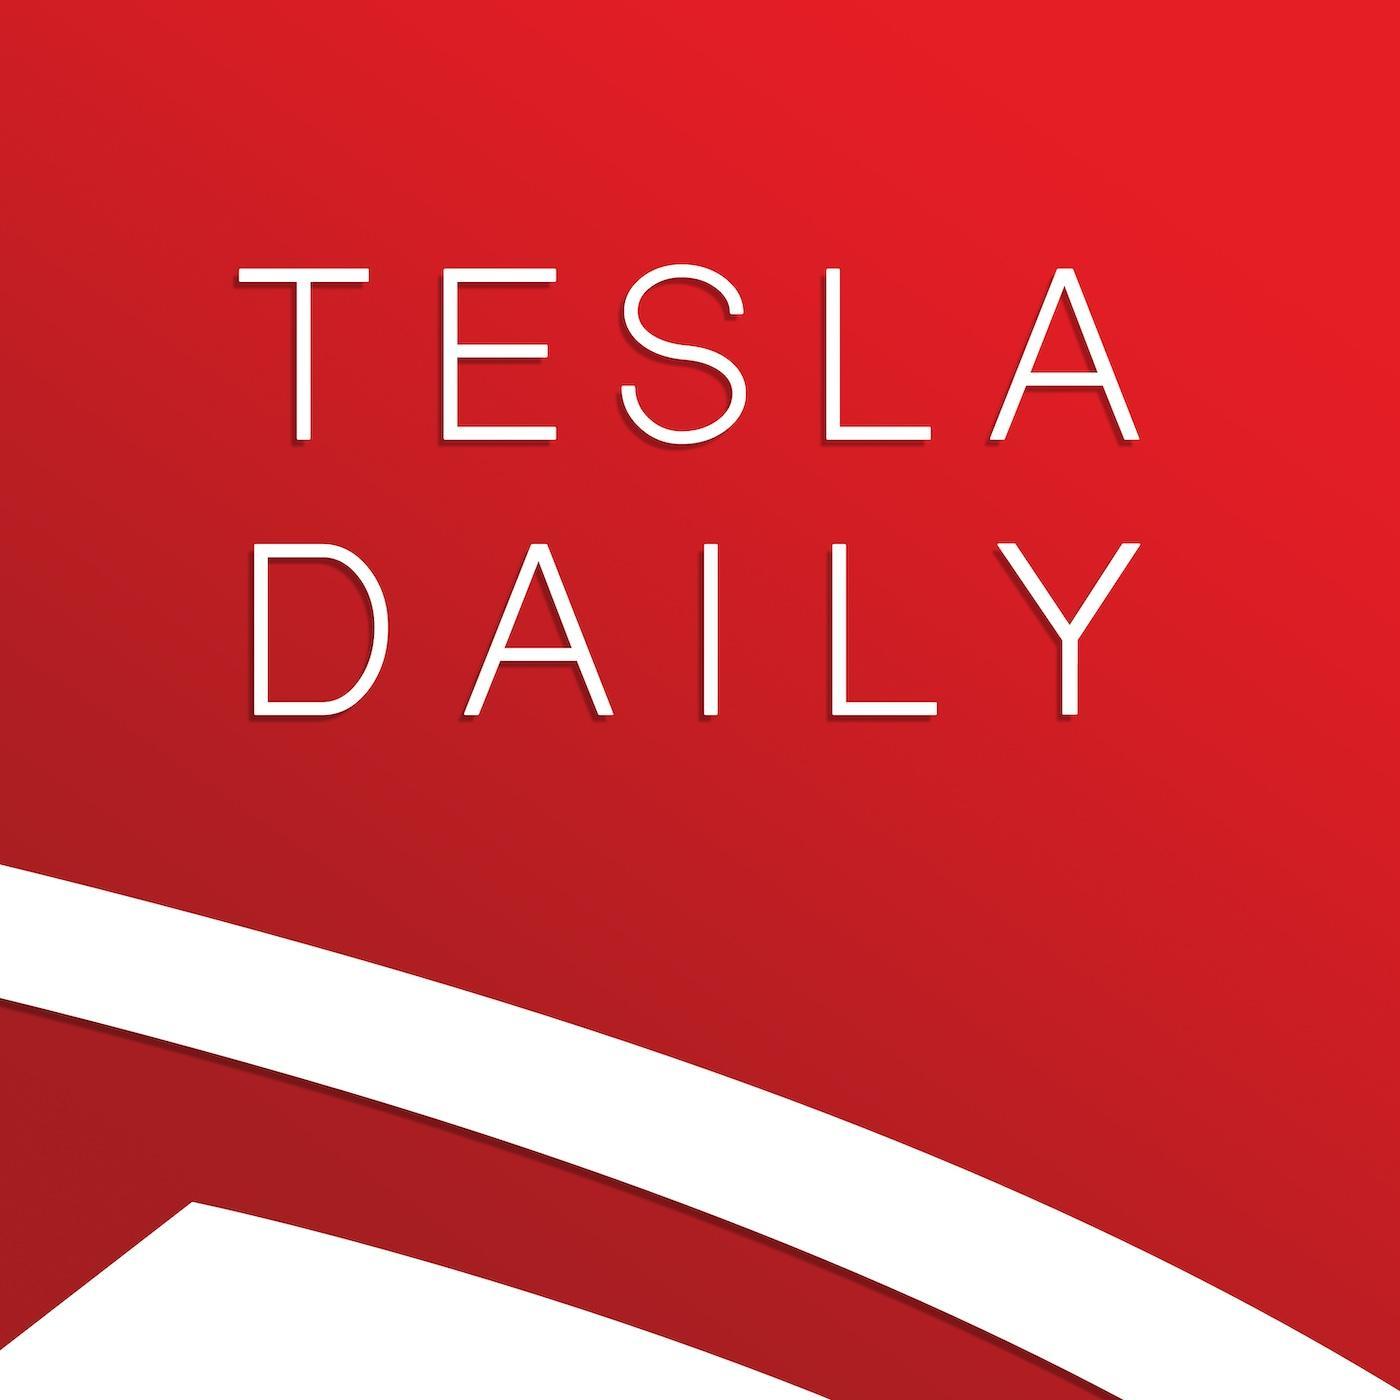 China June Numbers, Panasonic CEO on Musk, Goldman Note, Munro Model Y Update (07.08.20)